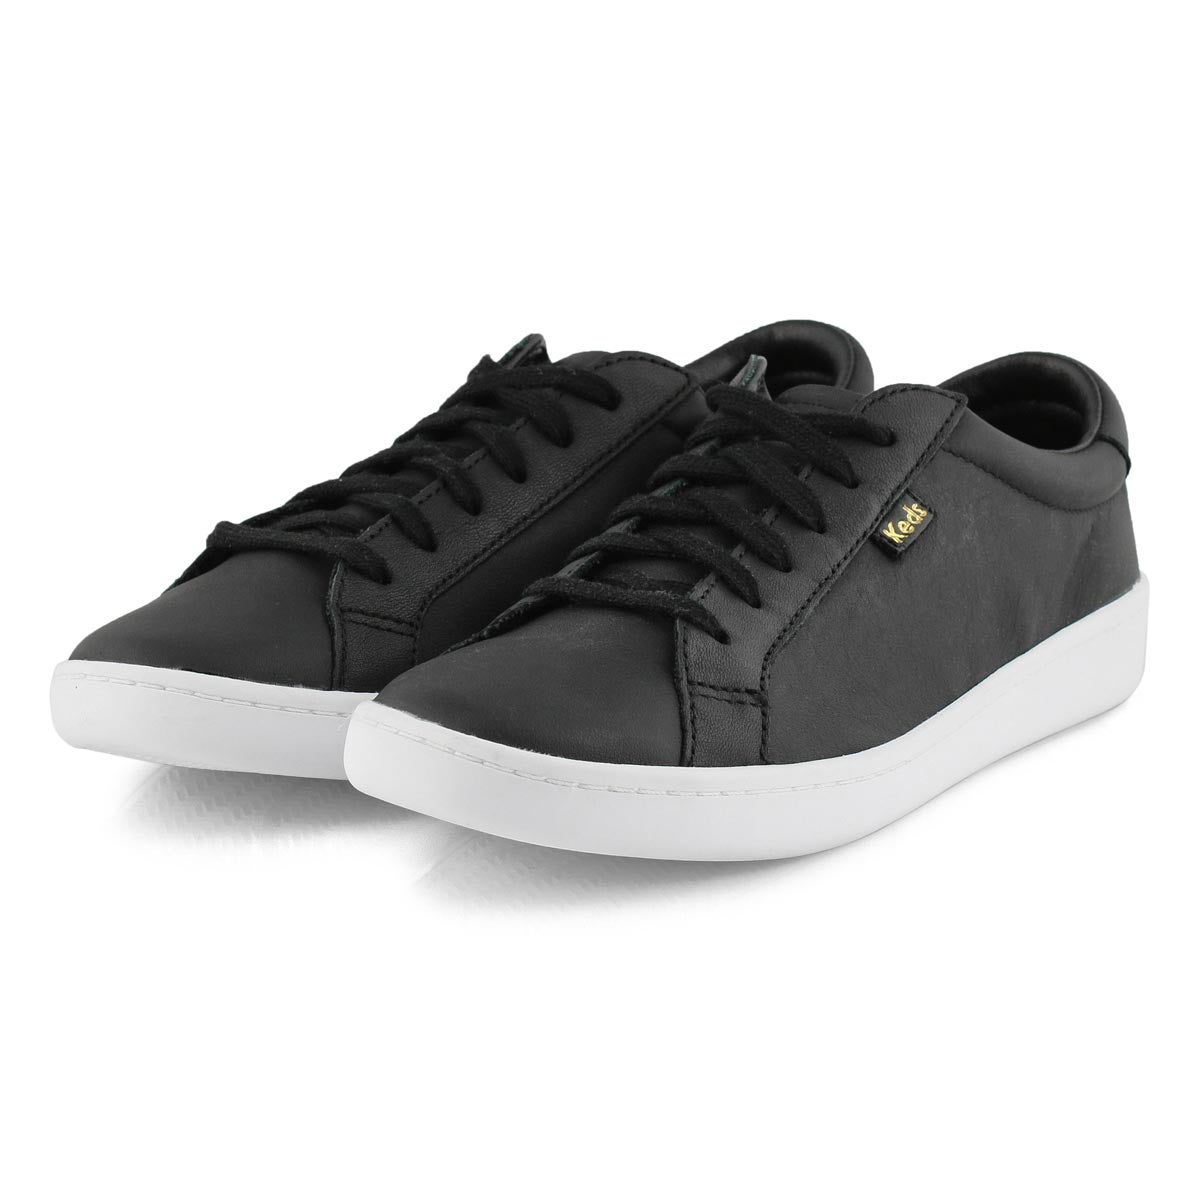 Women's Ace Sneaker - Black/White